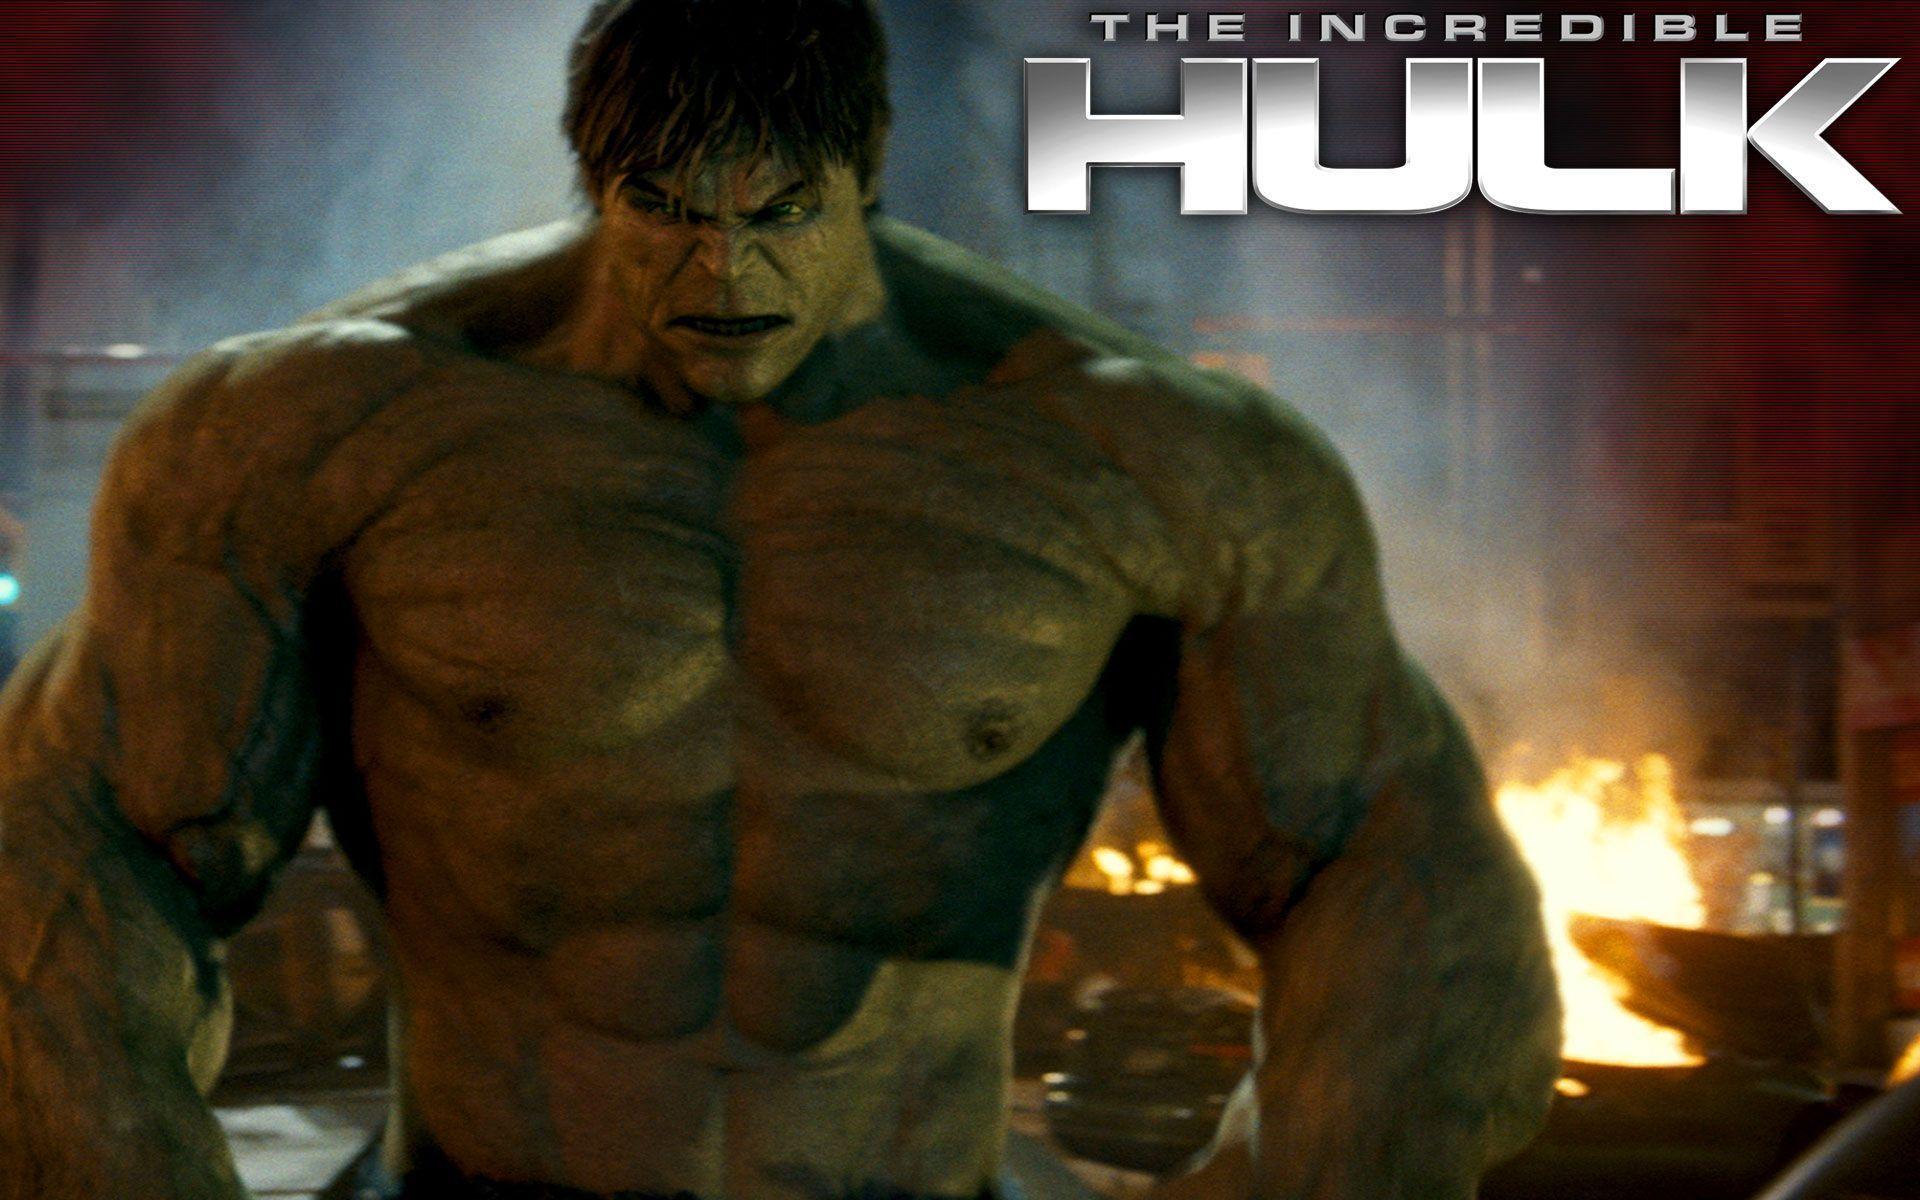 File The Incredible Hulk Wallpapers 2536IURjpg   4USkY 1920x1200